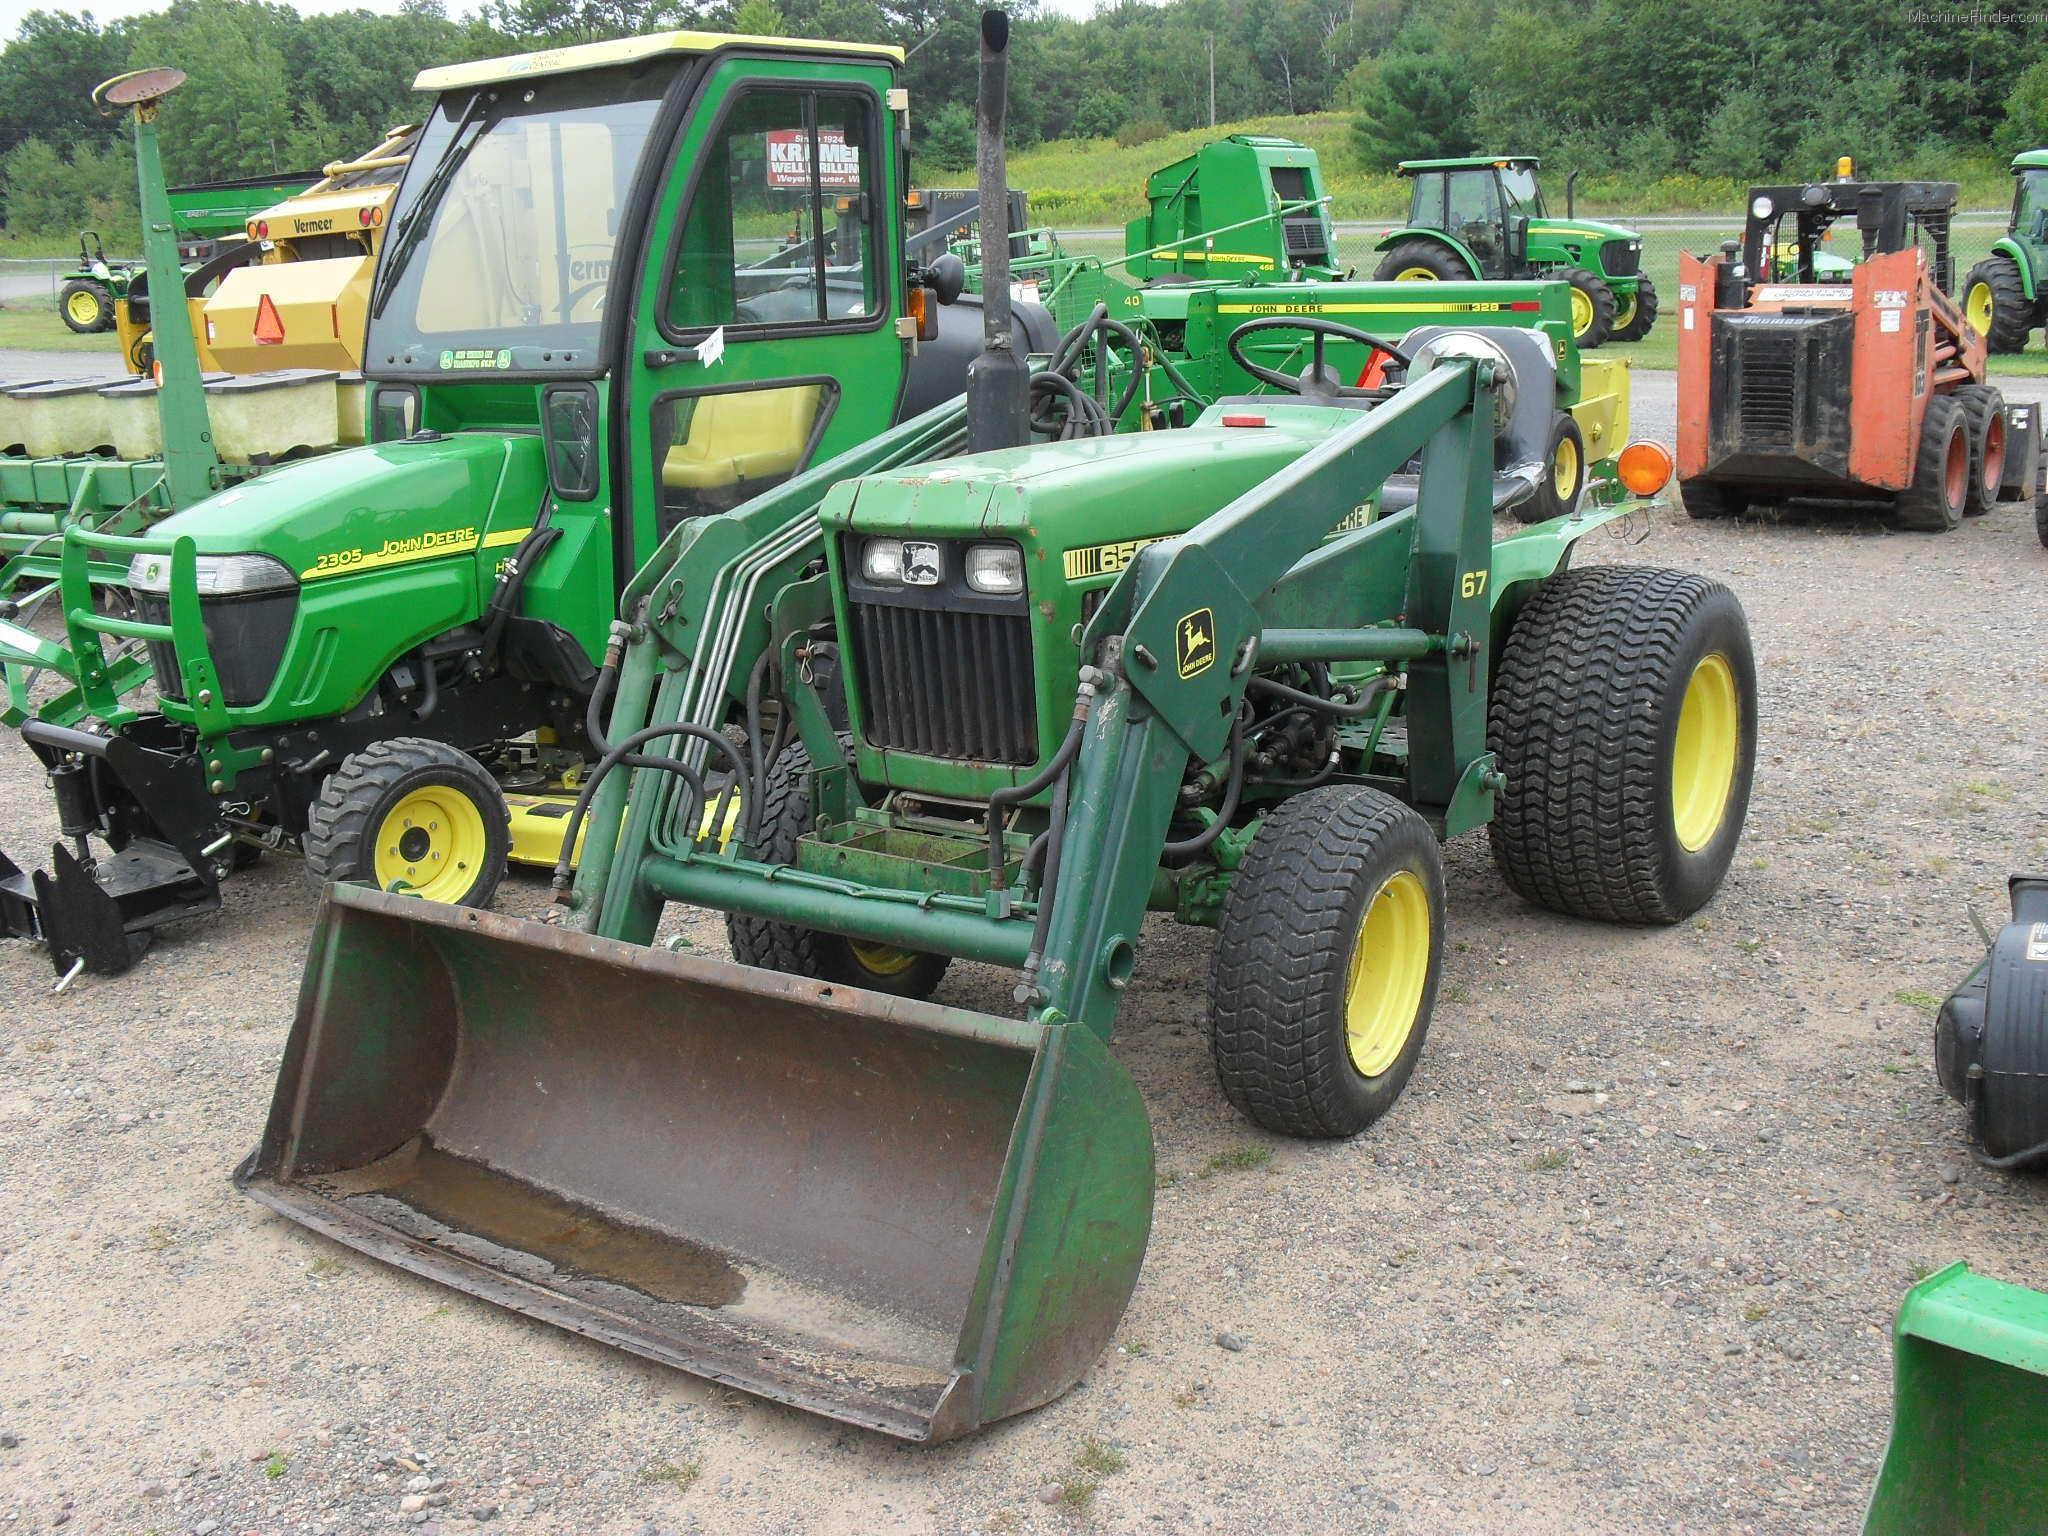 1981 John Deere 650 Tractors - Compact (1-40hp.) - John ...